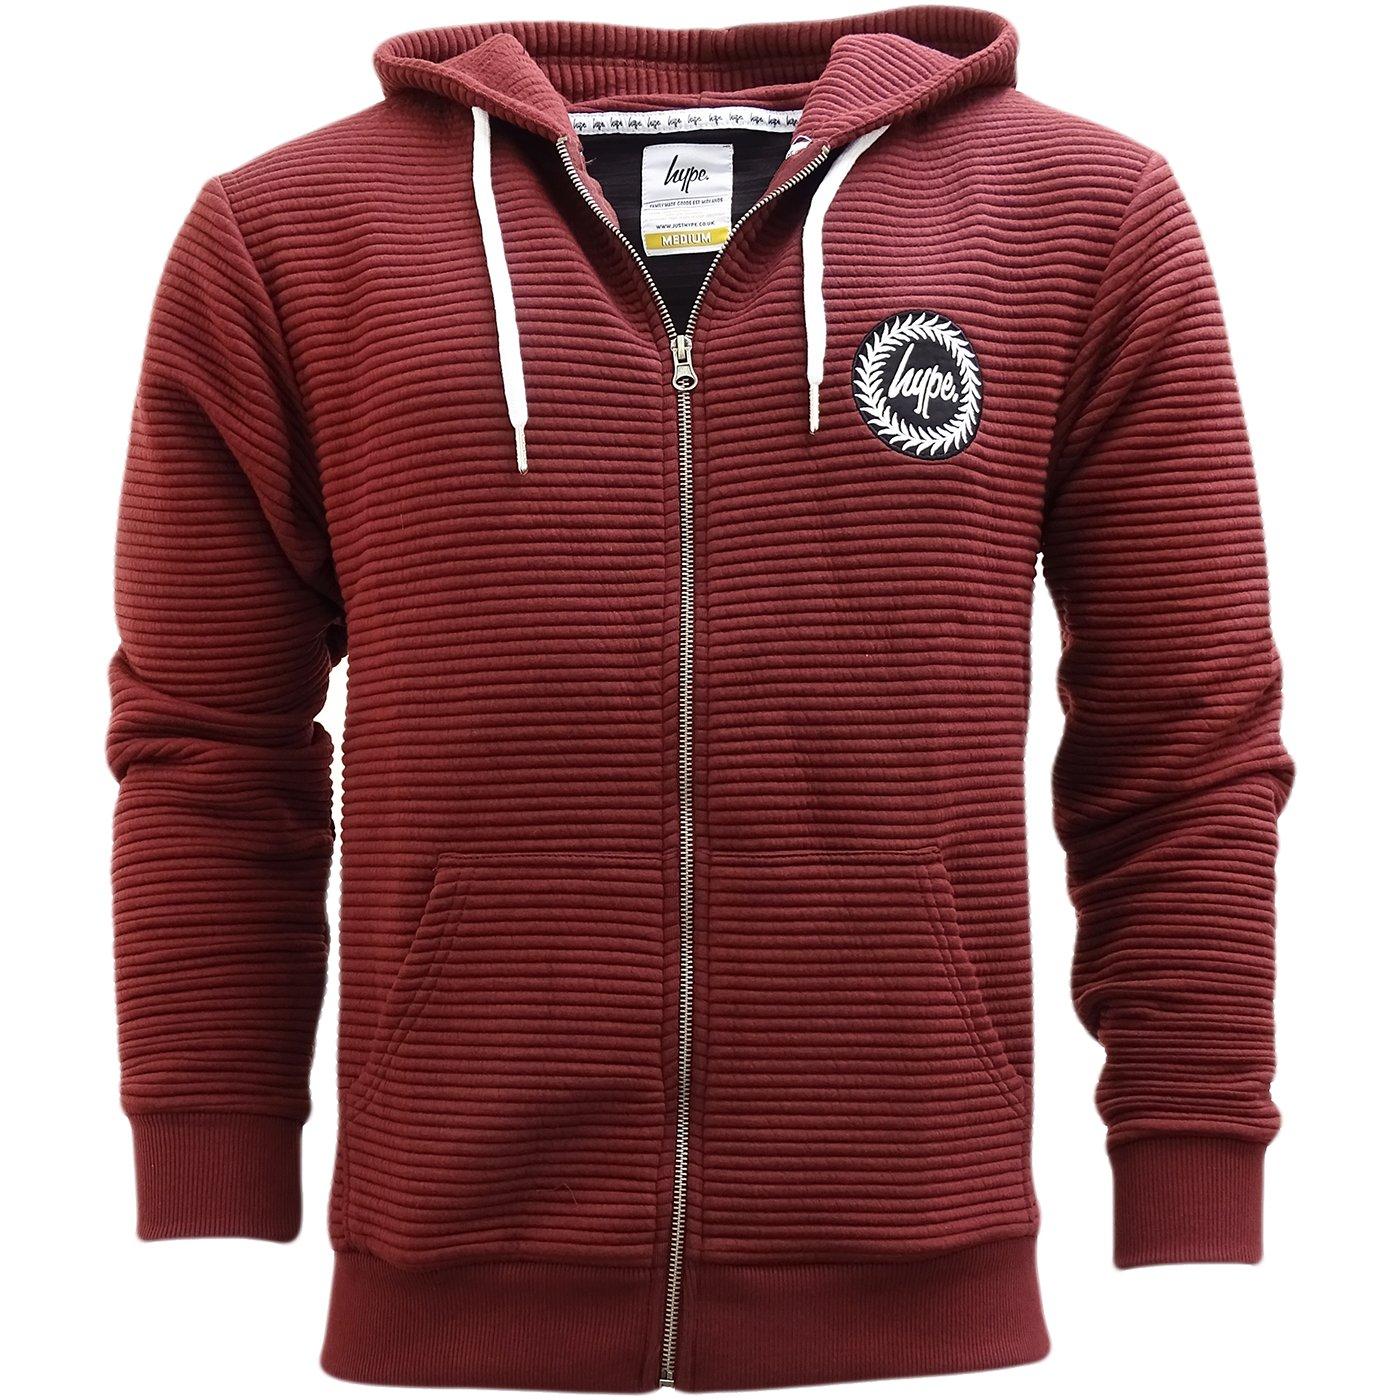 Just Hype Herren Sweater Sweatshirt, Einfarbig